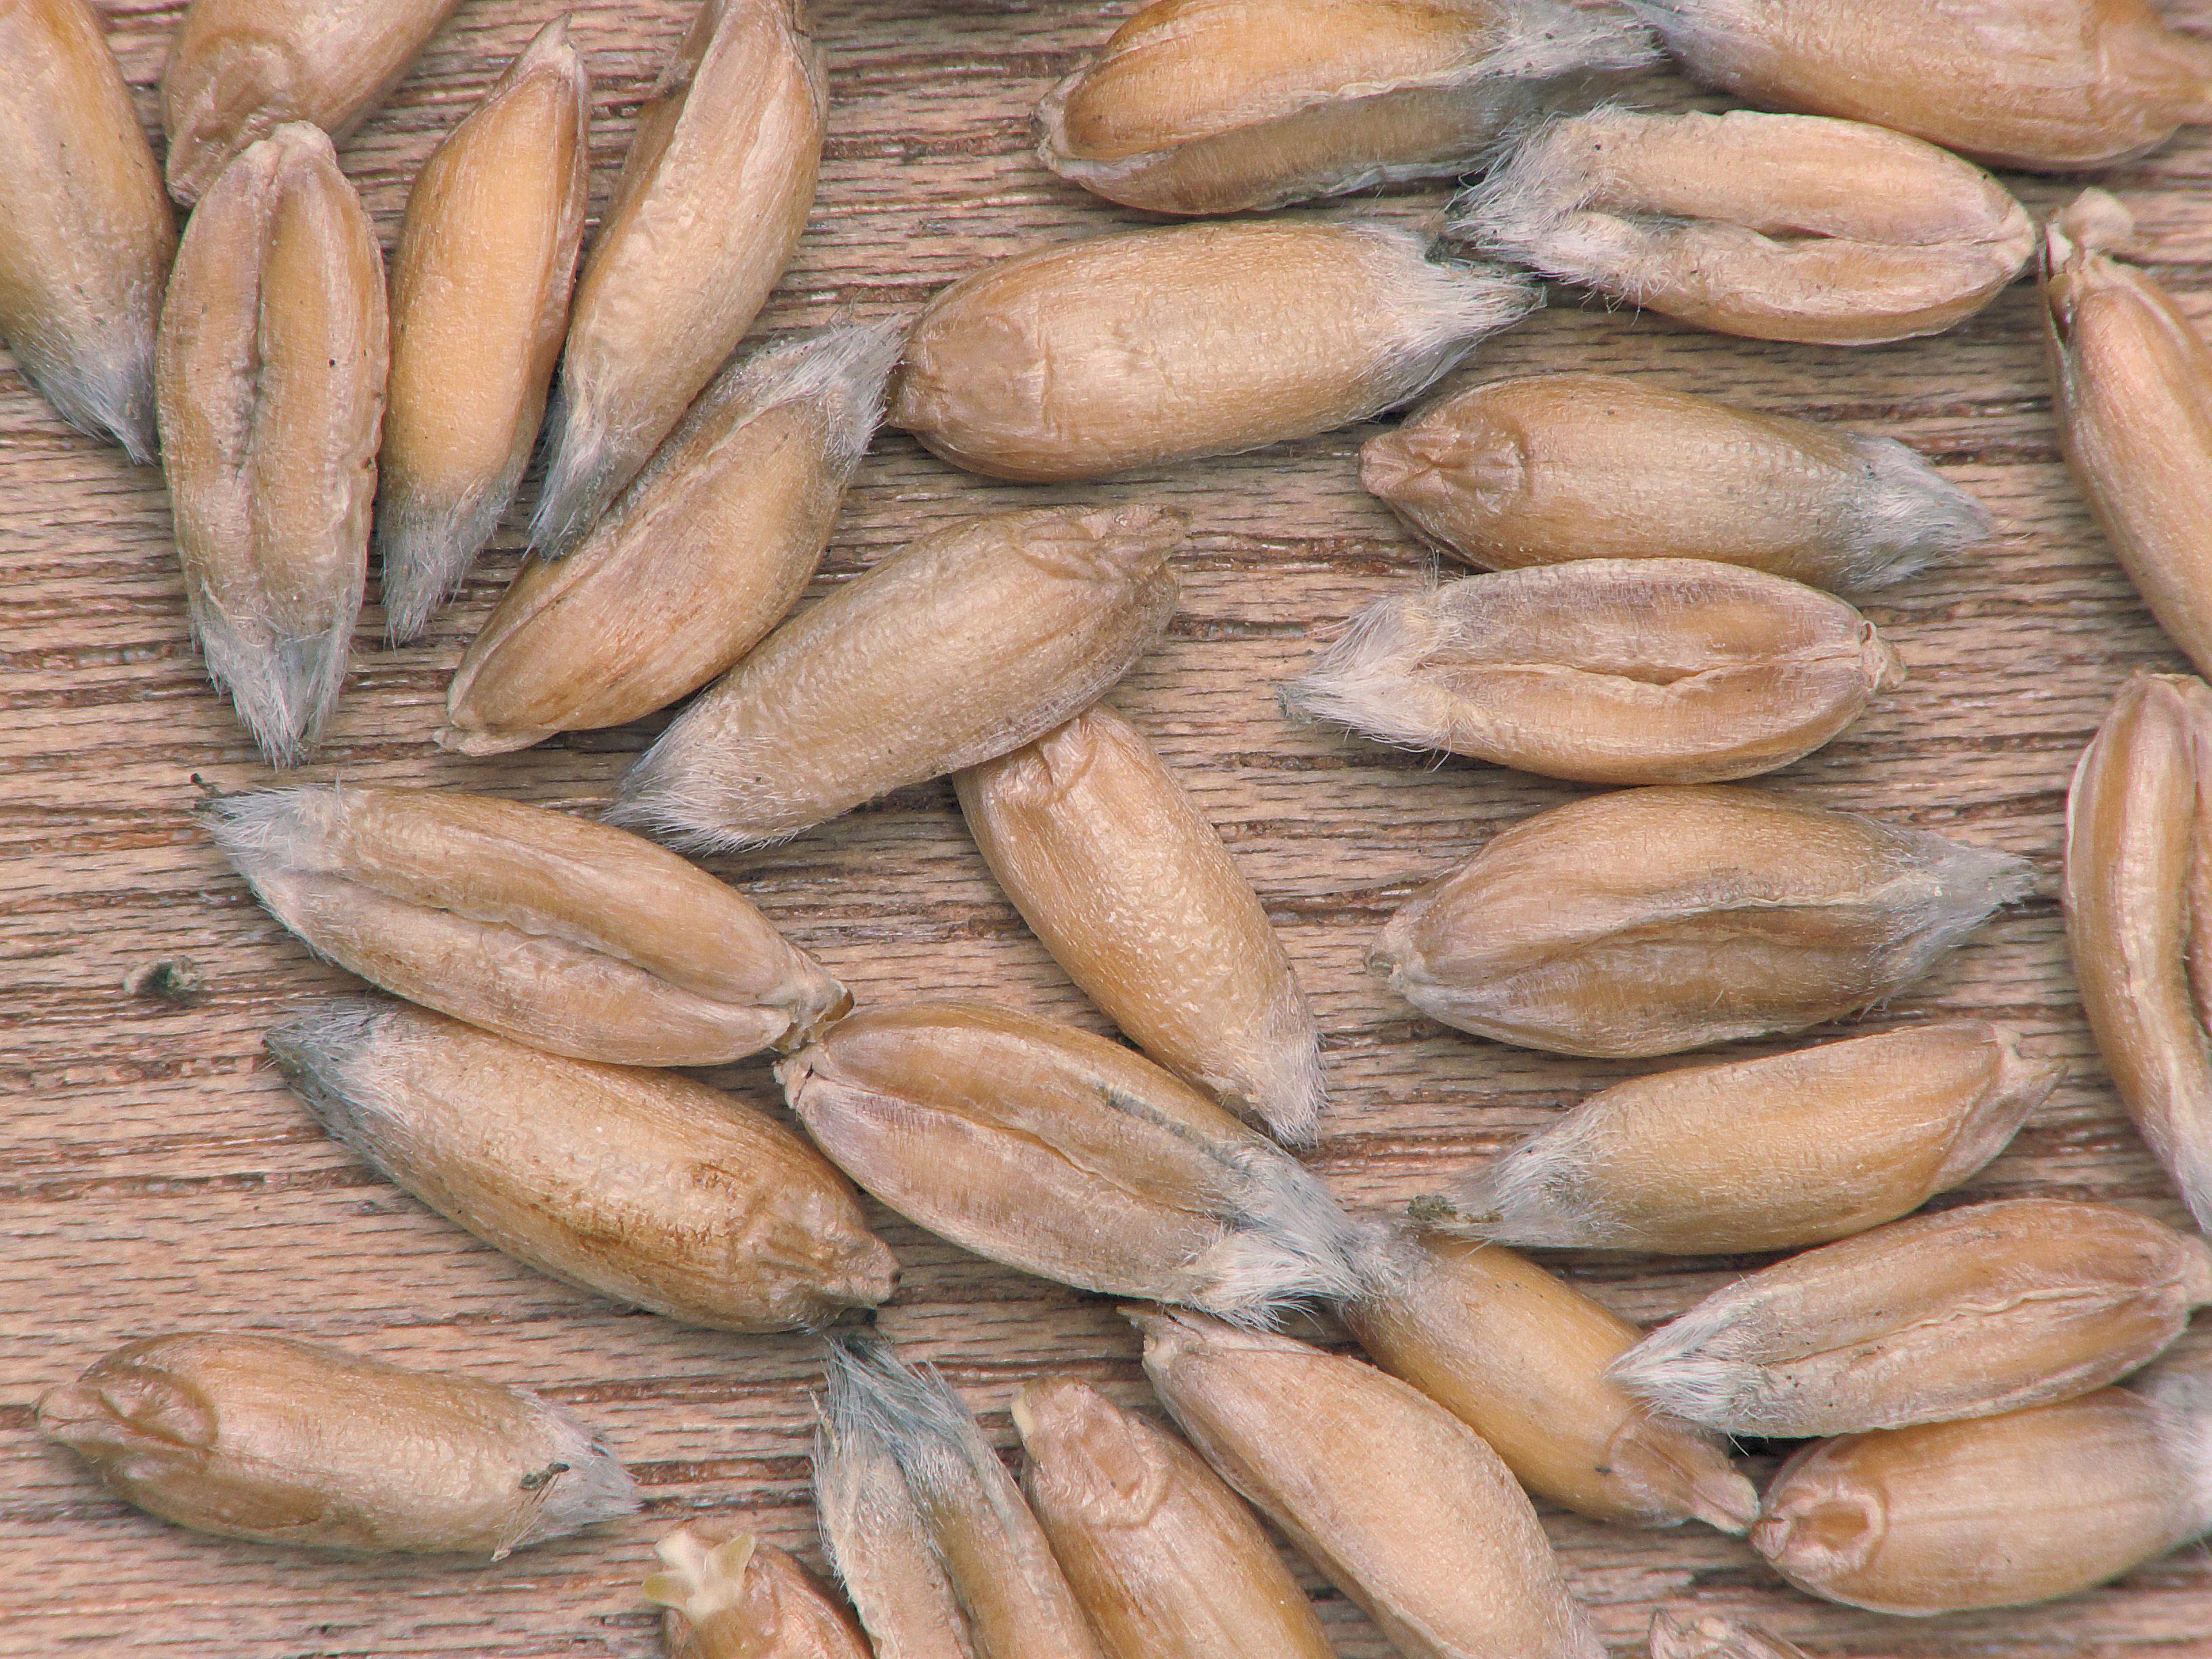 Image of spelt wheat